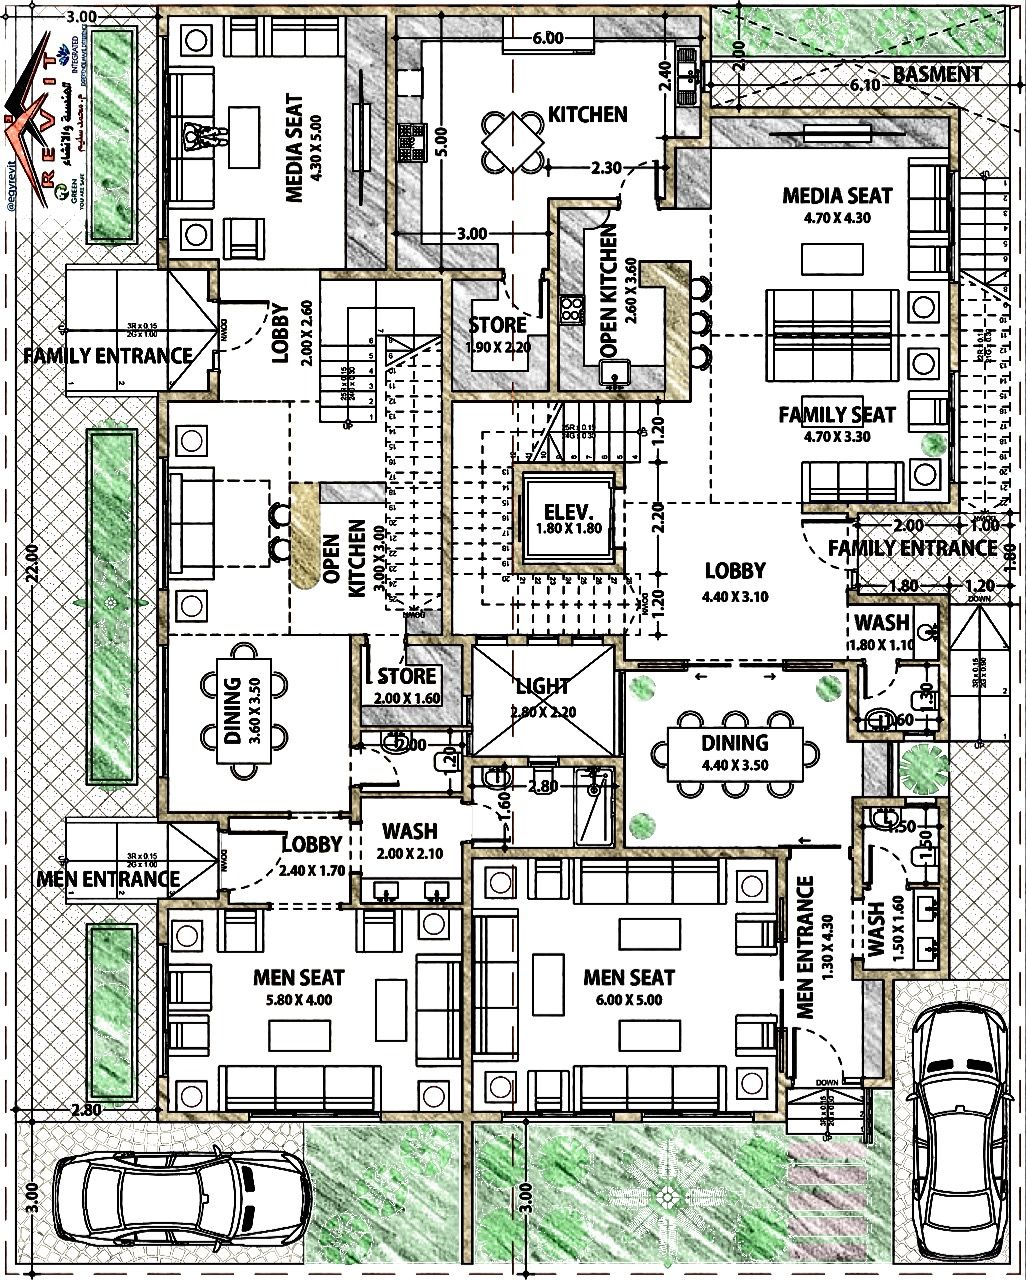 Arabia Villa مخطط فيلا للتواصل لعمل جميع التصاميم والديكور Twitter Egyrevit او الايميل Egyrevit Gmail C Family House Plans 2bhk House Plan Duplex House Design